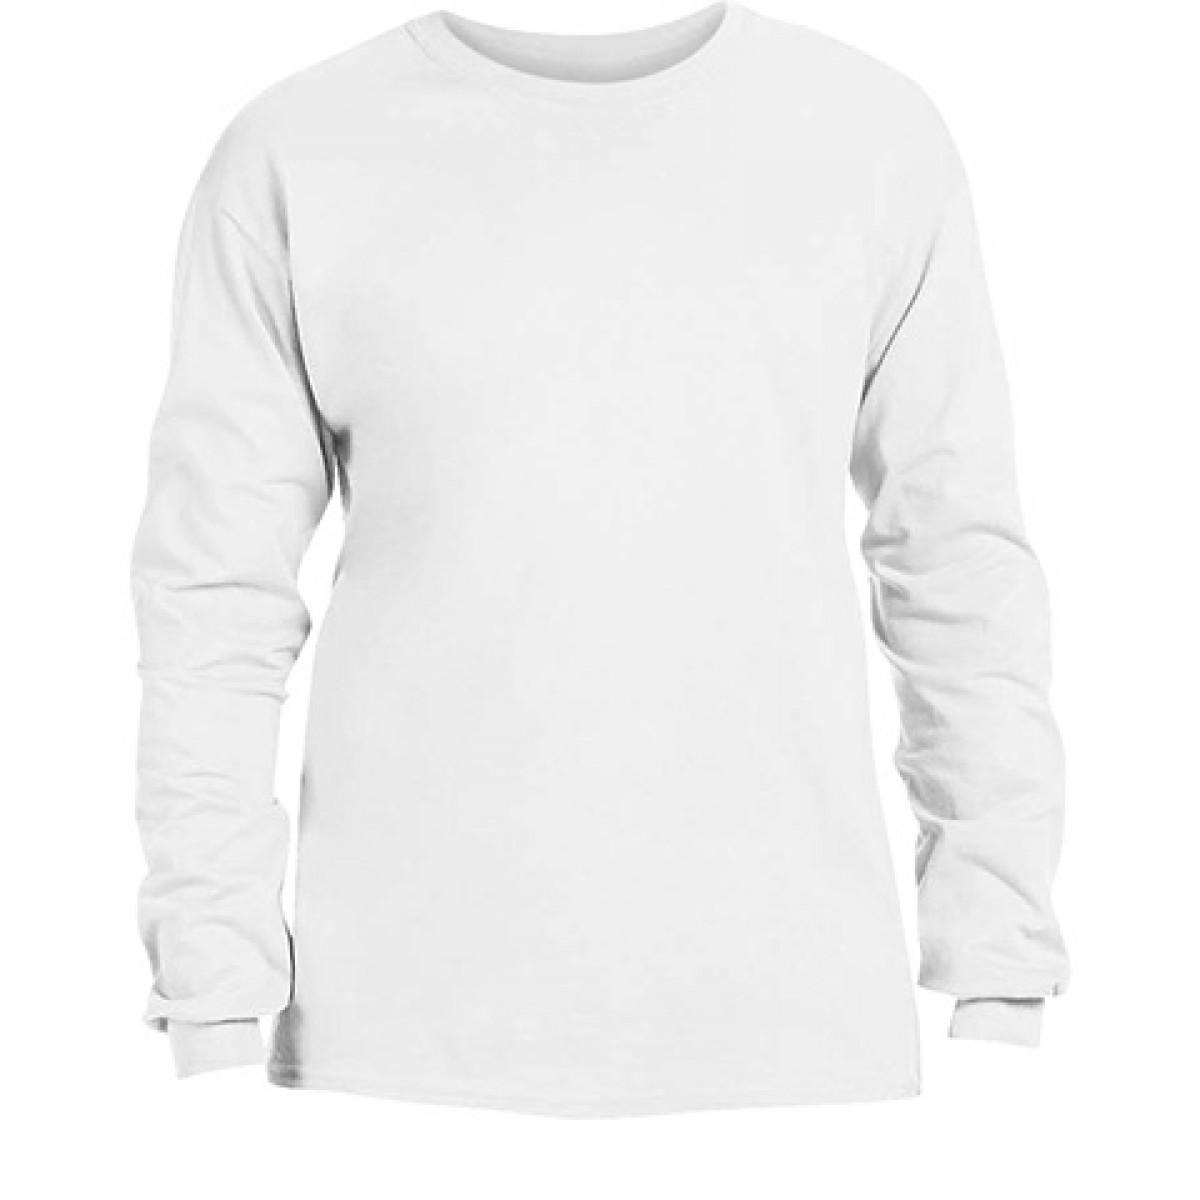 Adidas Long Sleeve T-shirt With Adidas logo